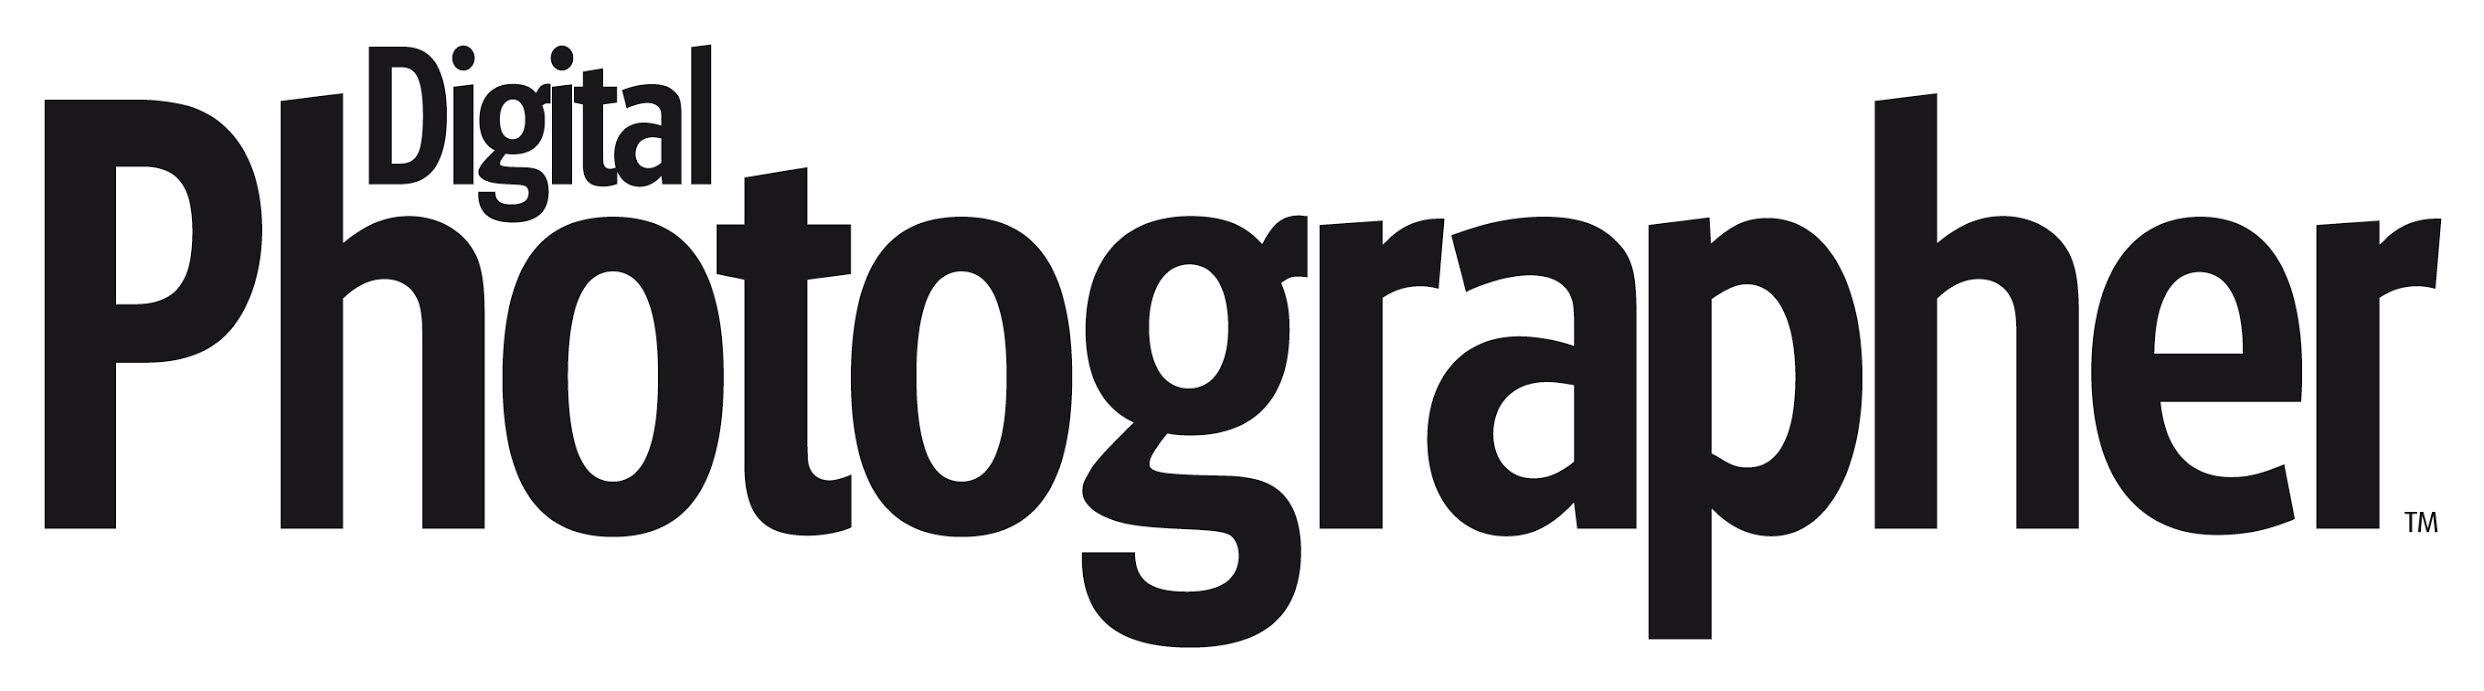 Digital Photographer.jpg